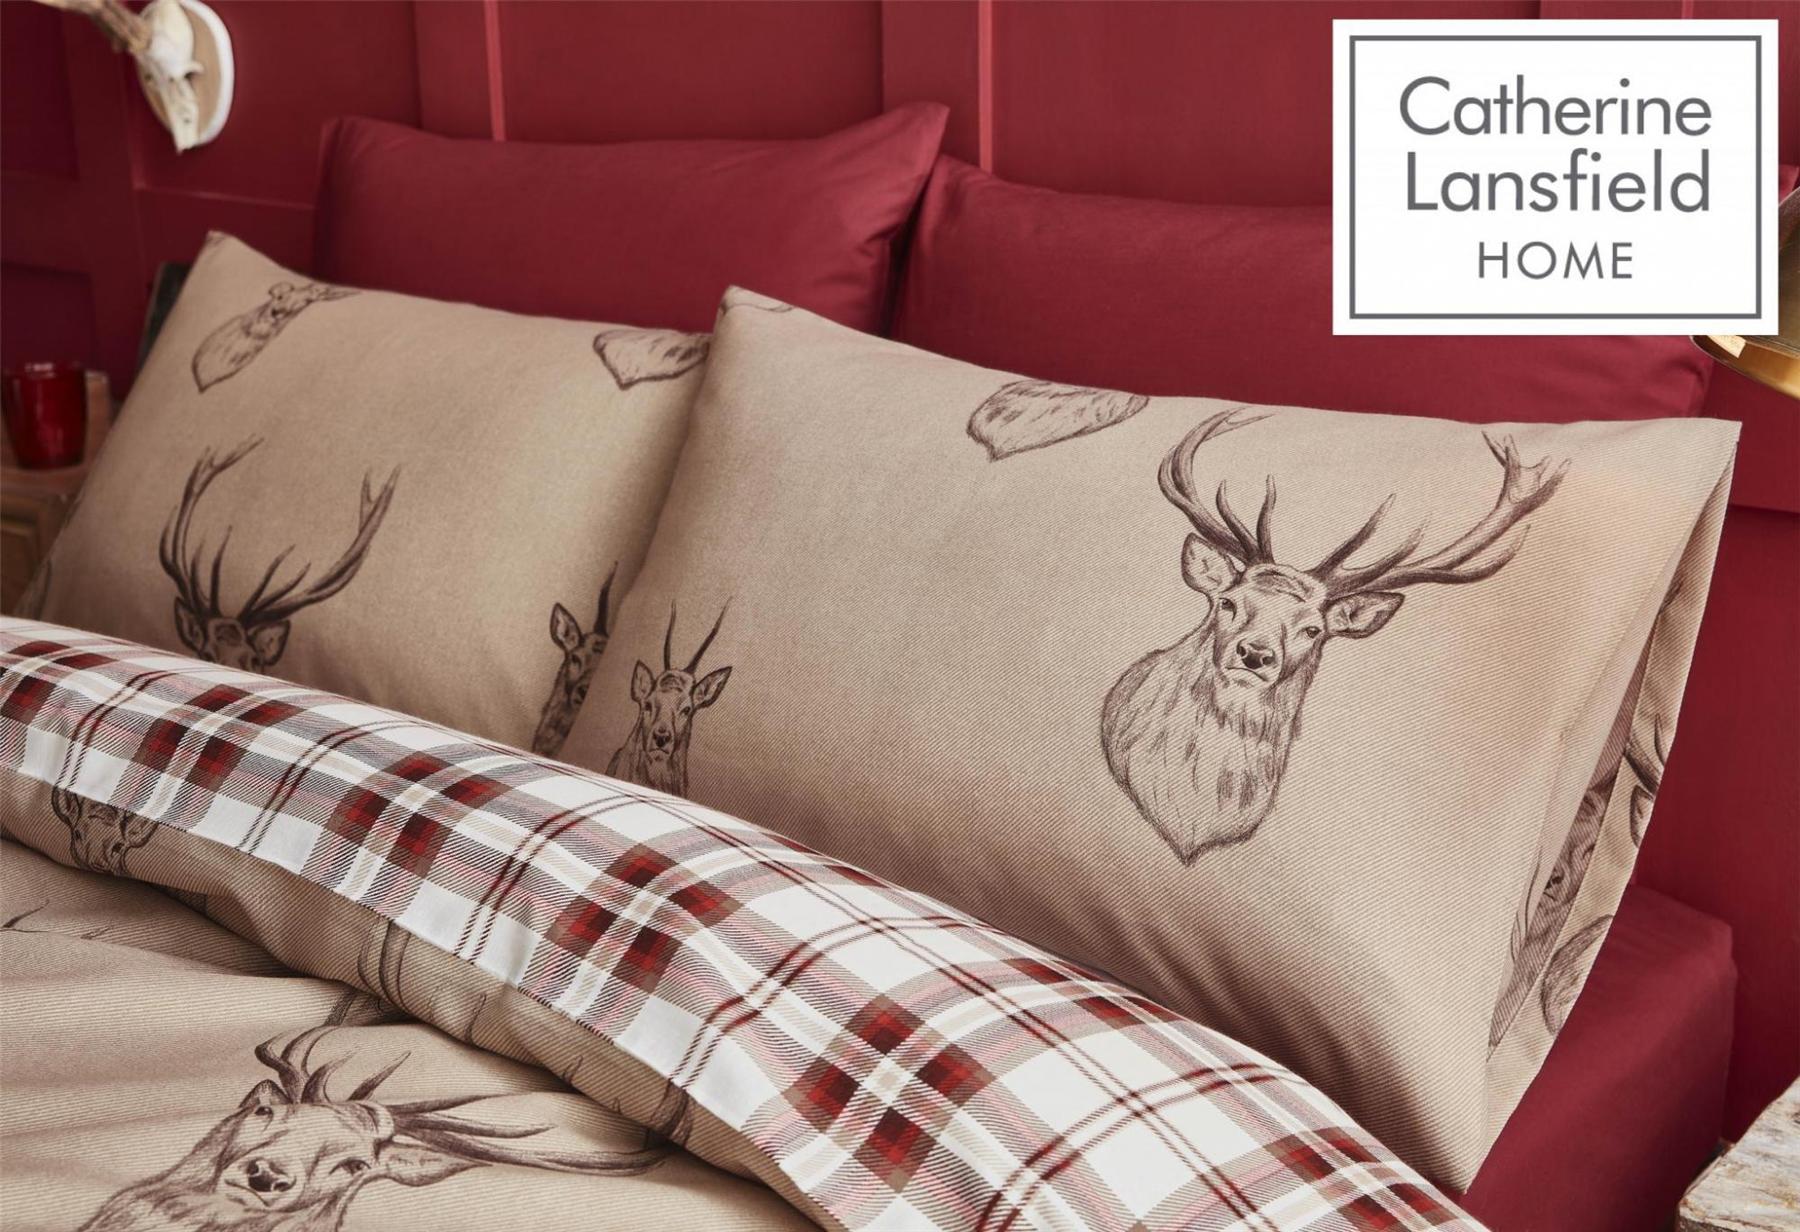 Catherine-Lansfield-Duvet-Set-Highland-Stag-Reversible-Check-Bedding-Mushroom thumbnail 17